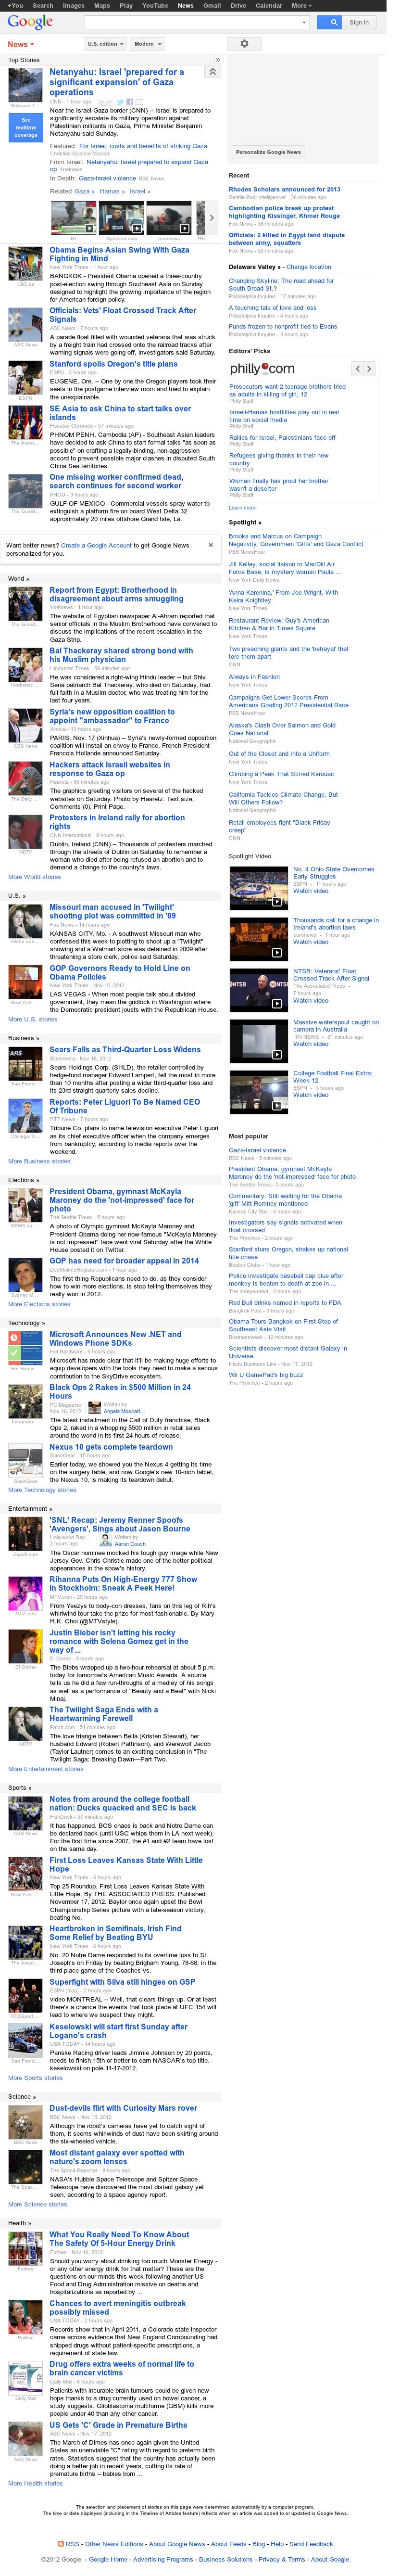 Google News at Sunday Nov. 18, 2012, 12:09 p.m. UTC